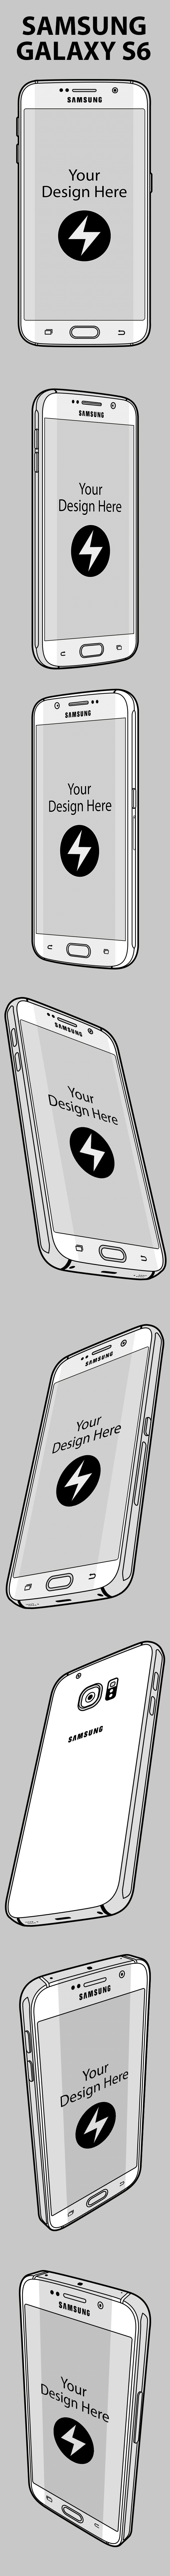 line_samsung-galaxy-s6_mockup_07